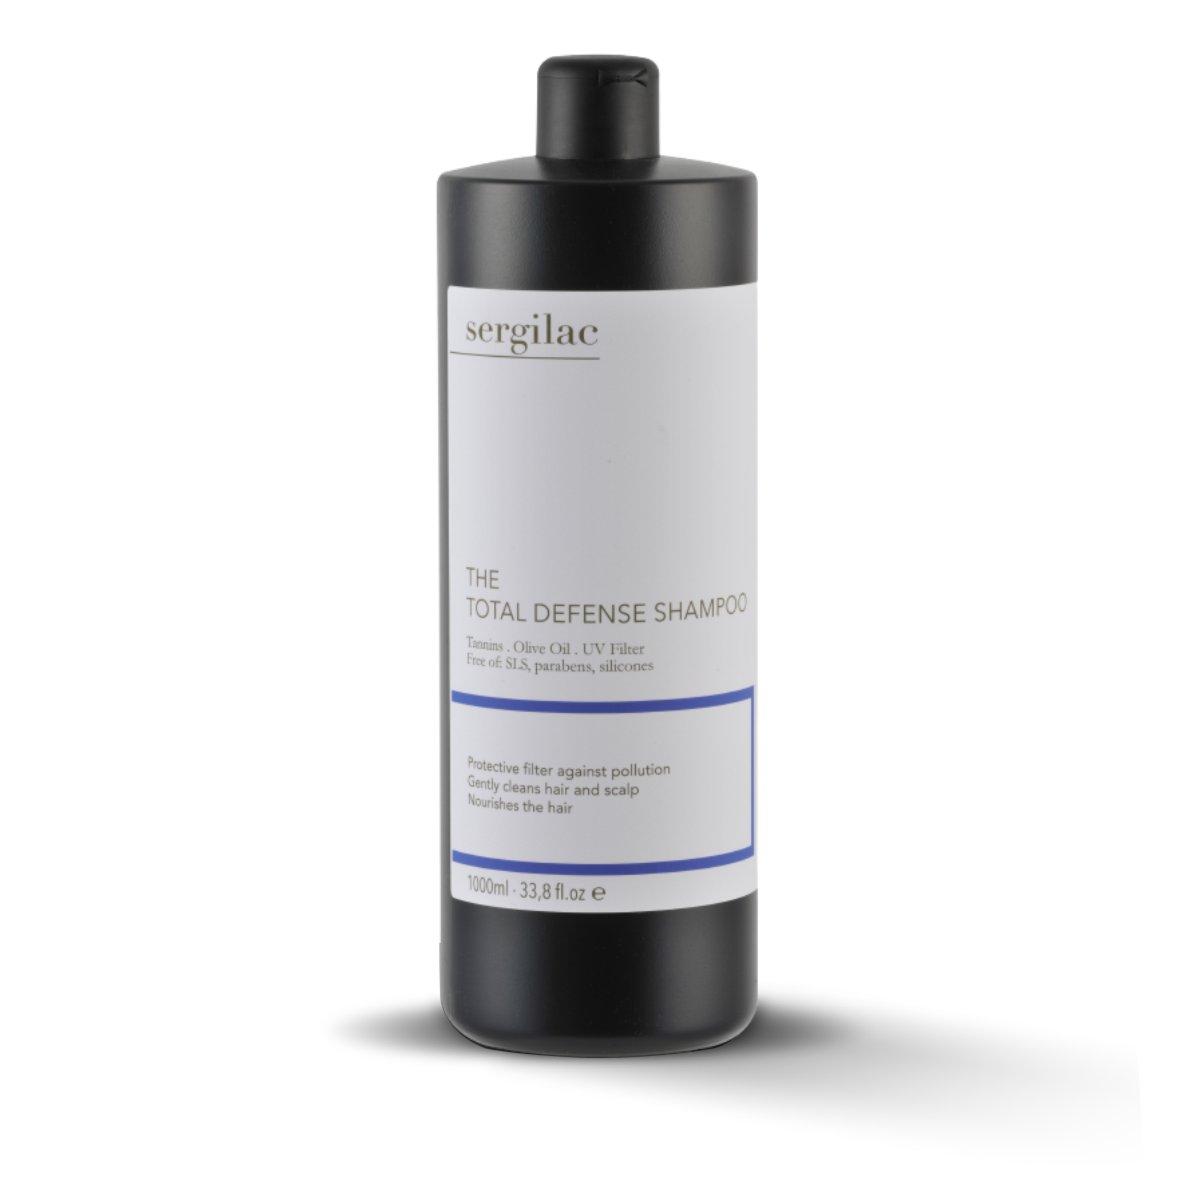 The Total Defense Shampoo - Sergilac 1 Litro